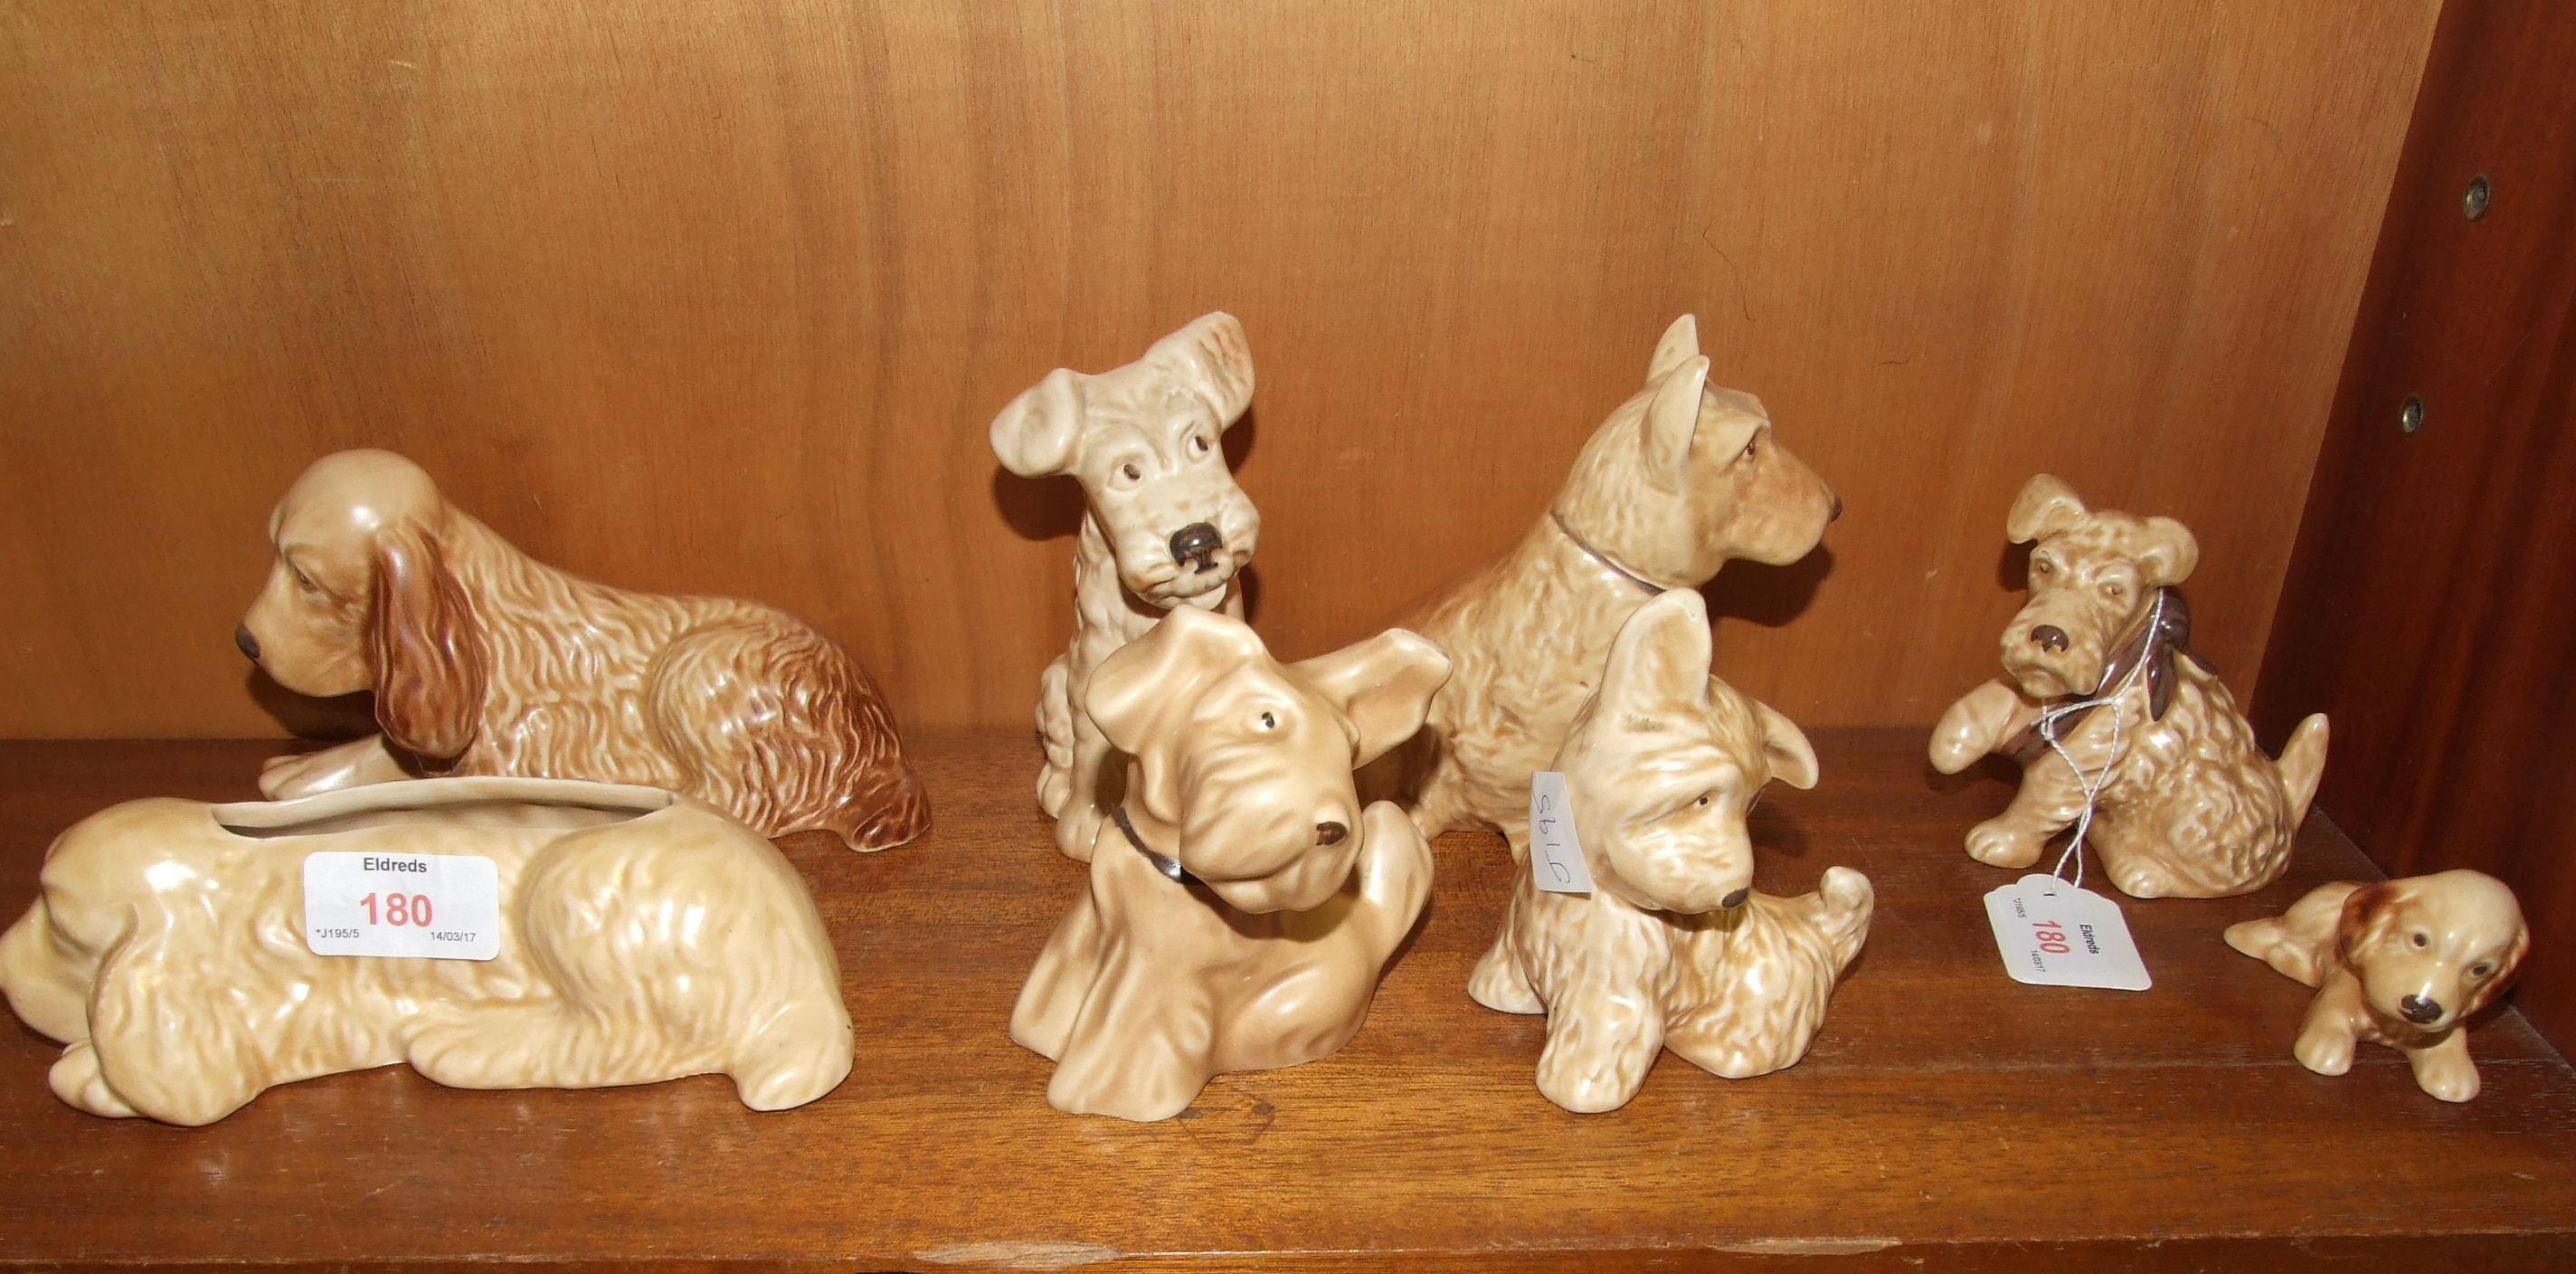 Lot 180 - Eight beige glazed SylvaC dog ornaments, no.s: 2025, 114 (af), 1119, 1378, 1205, 73, 116, 1433, (